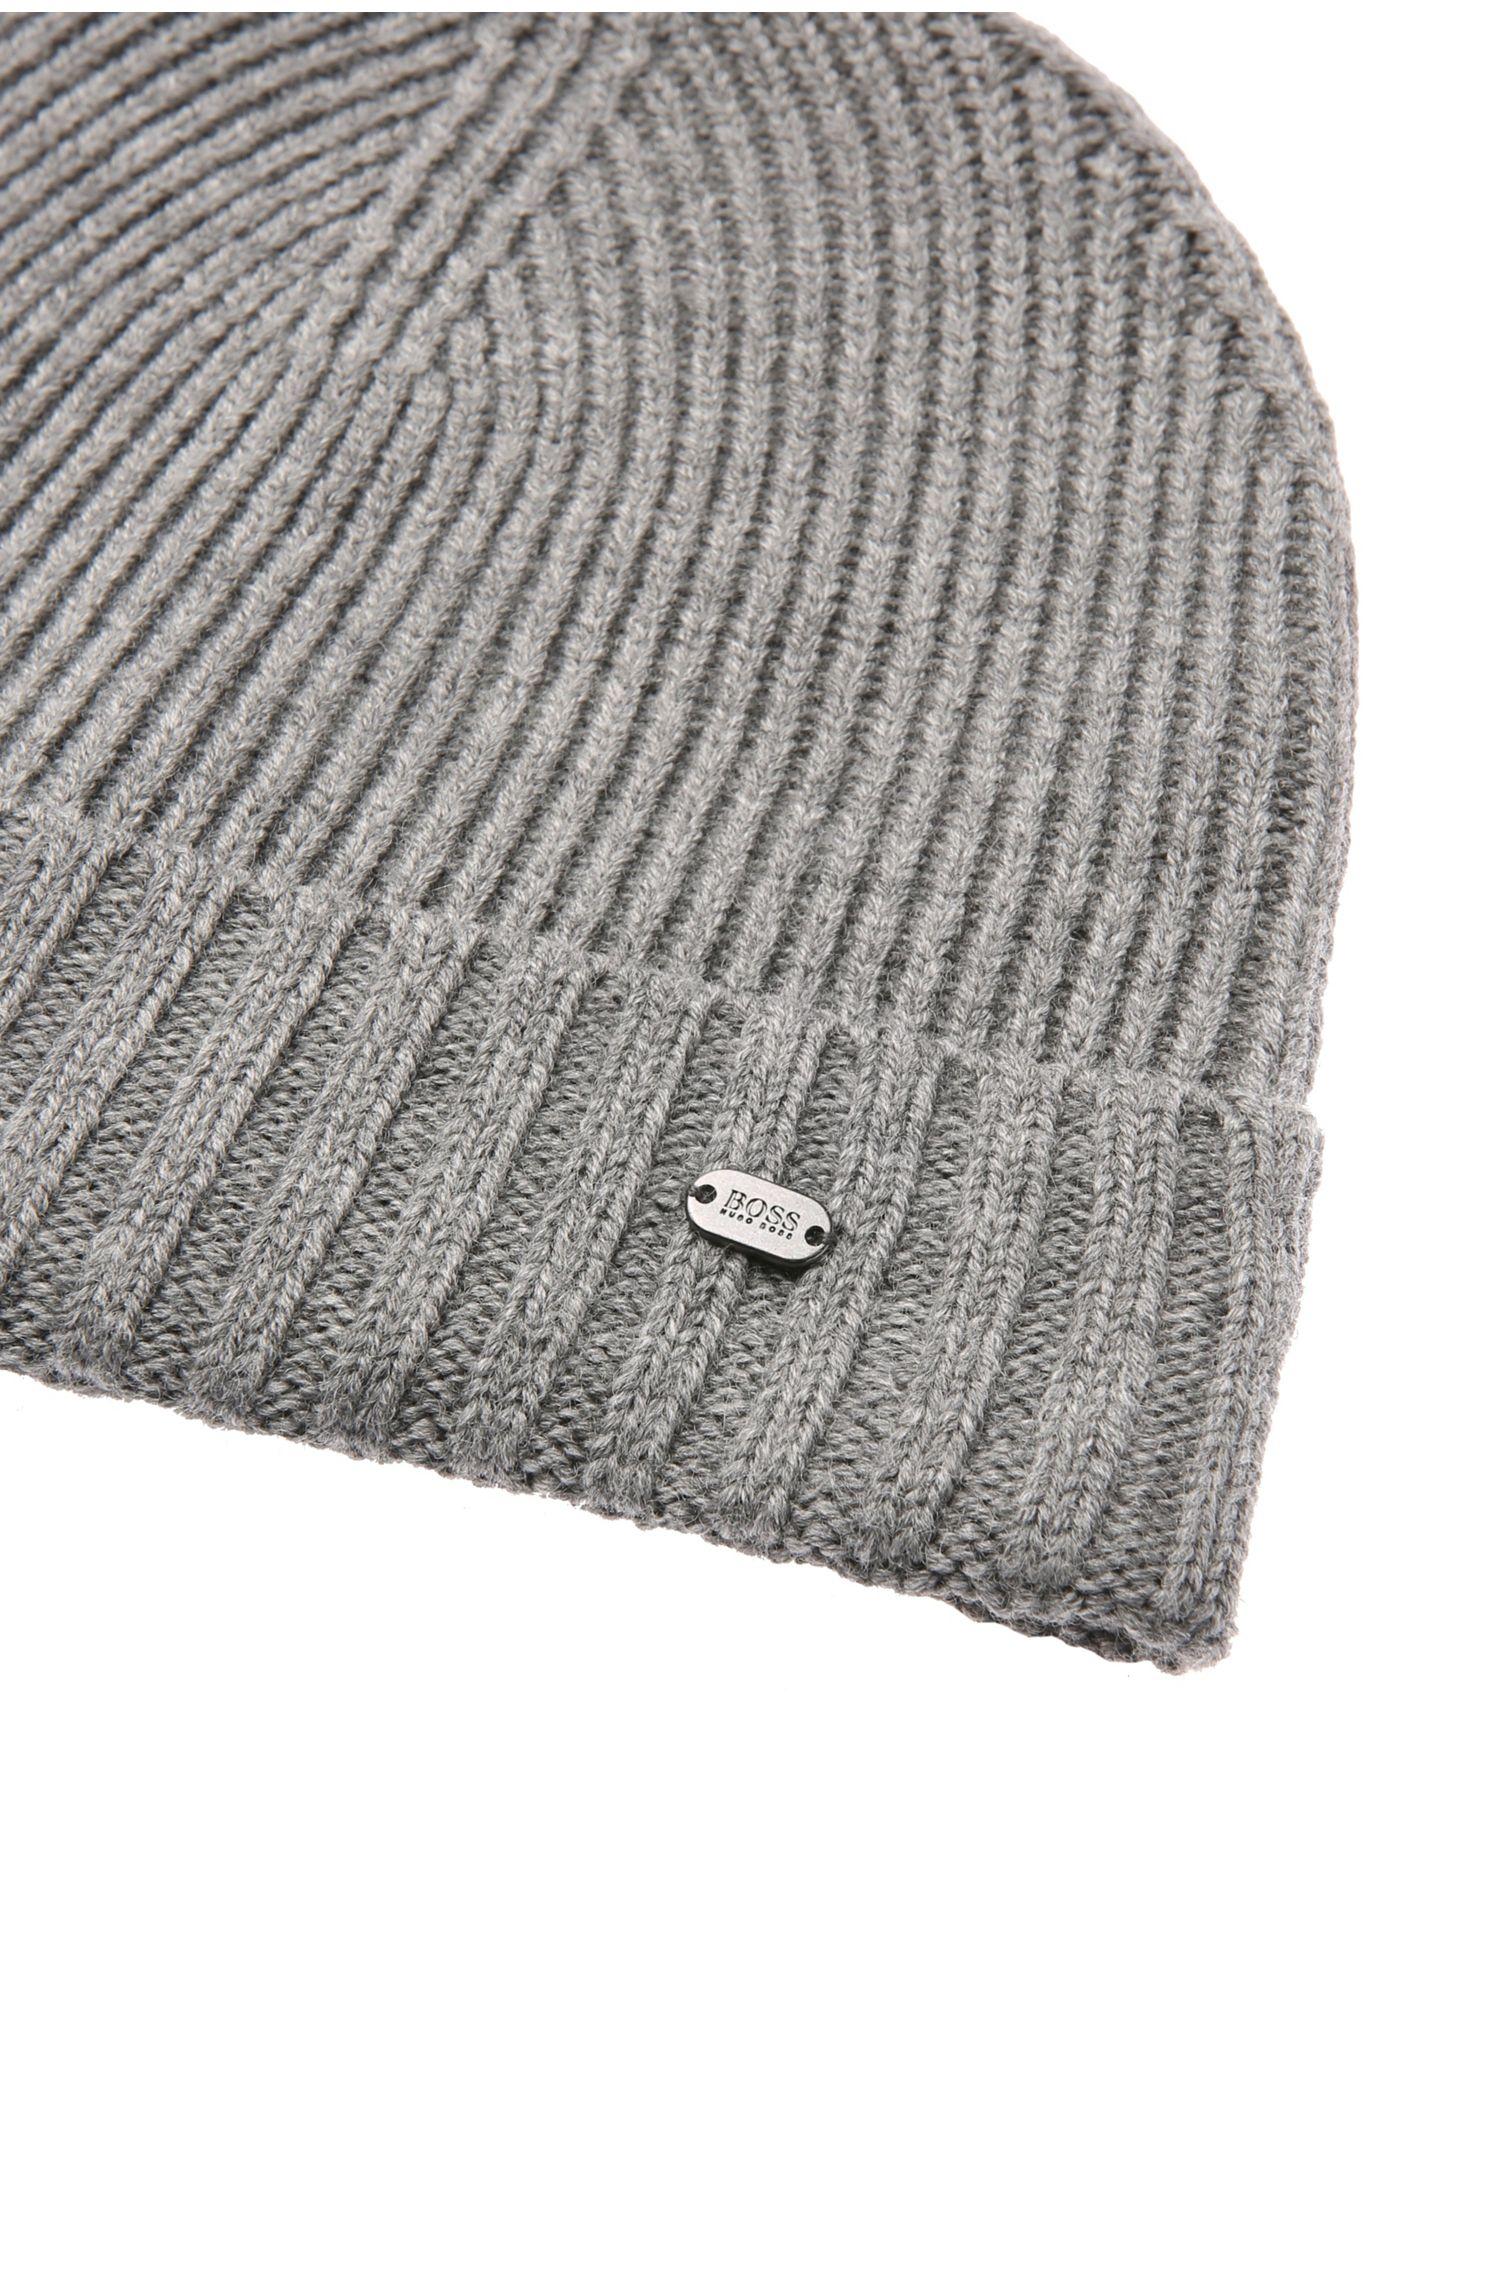 Virgin Wool Beanie | C-Fati